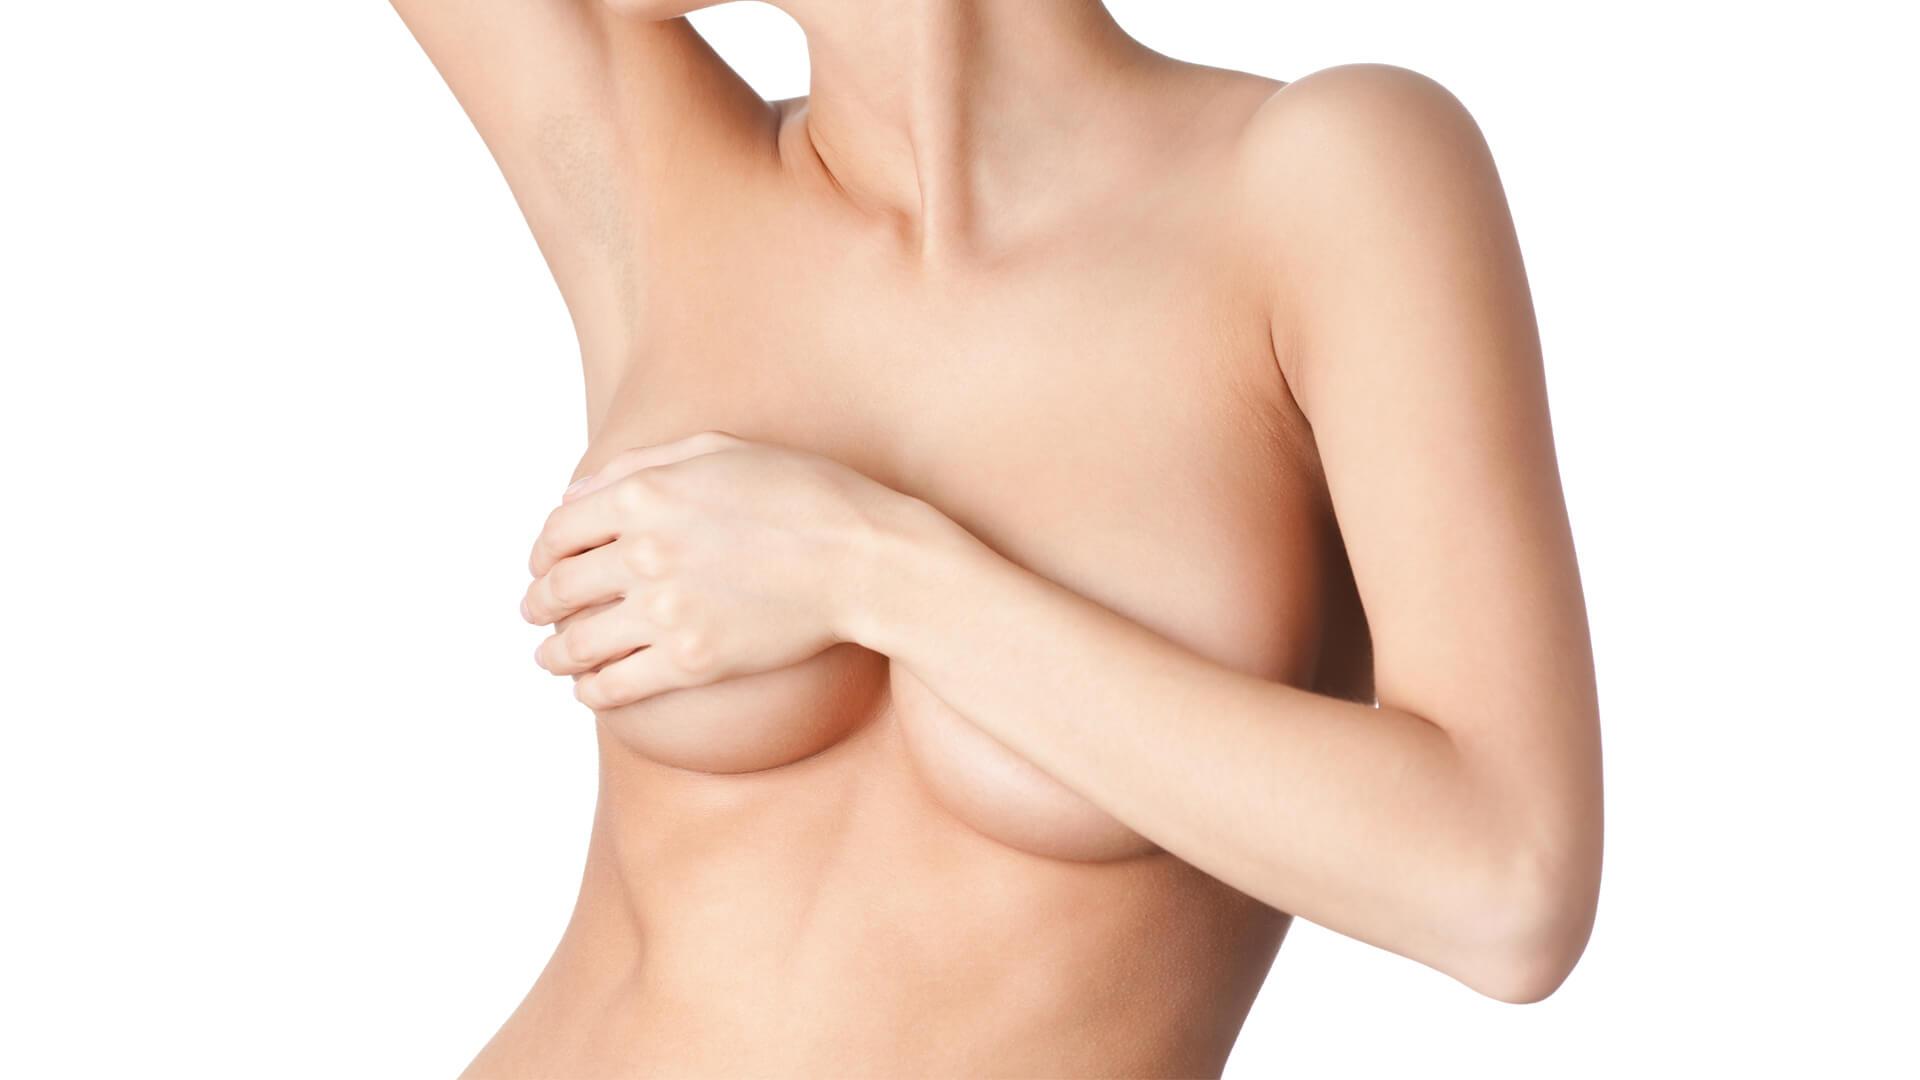 breast image